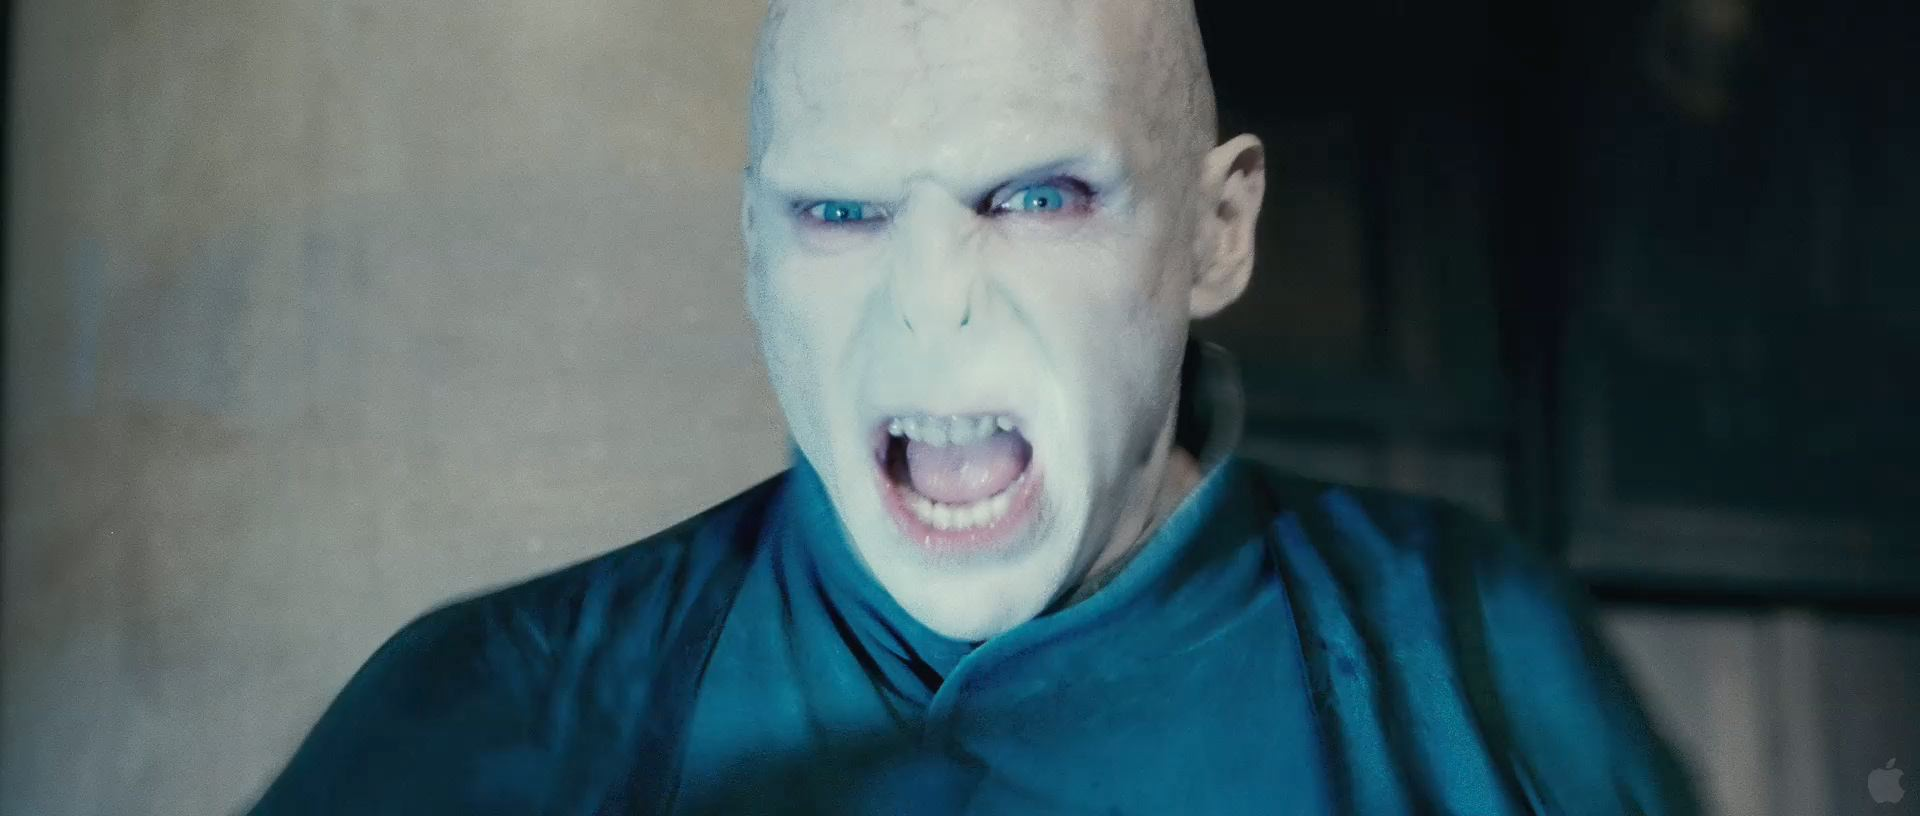 Harry Potter BlogHogwarts HP7 2 Trailer 37